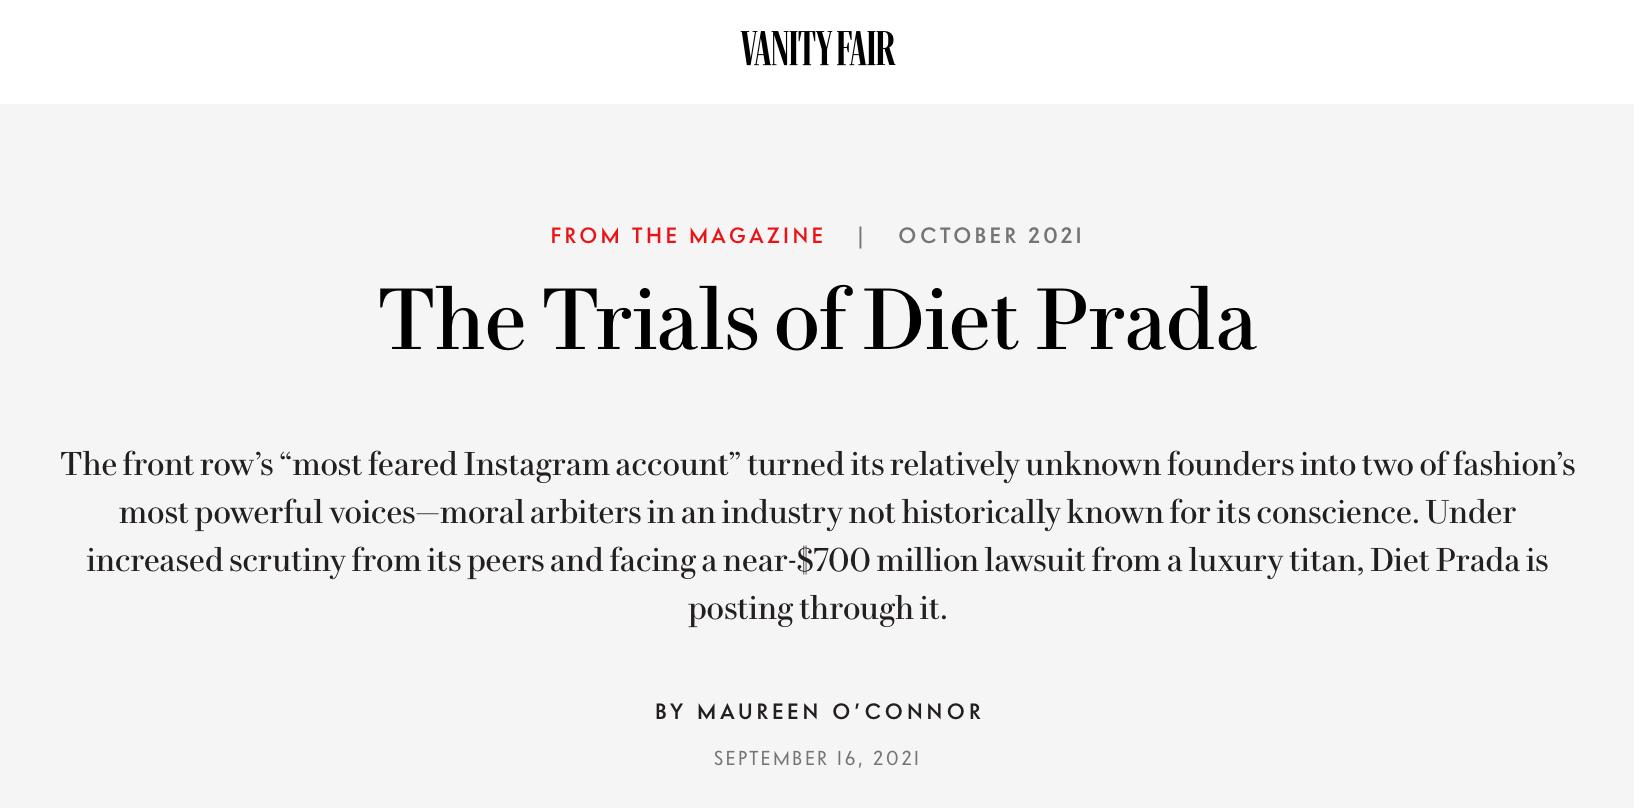 Vanity Fair article, The Trials of Diet Prada